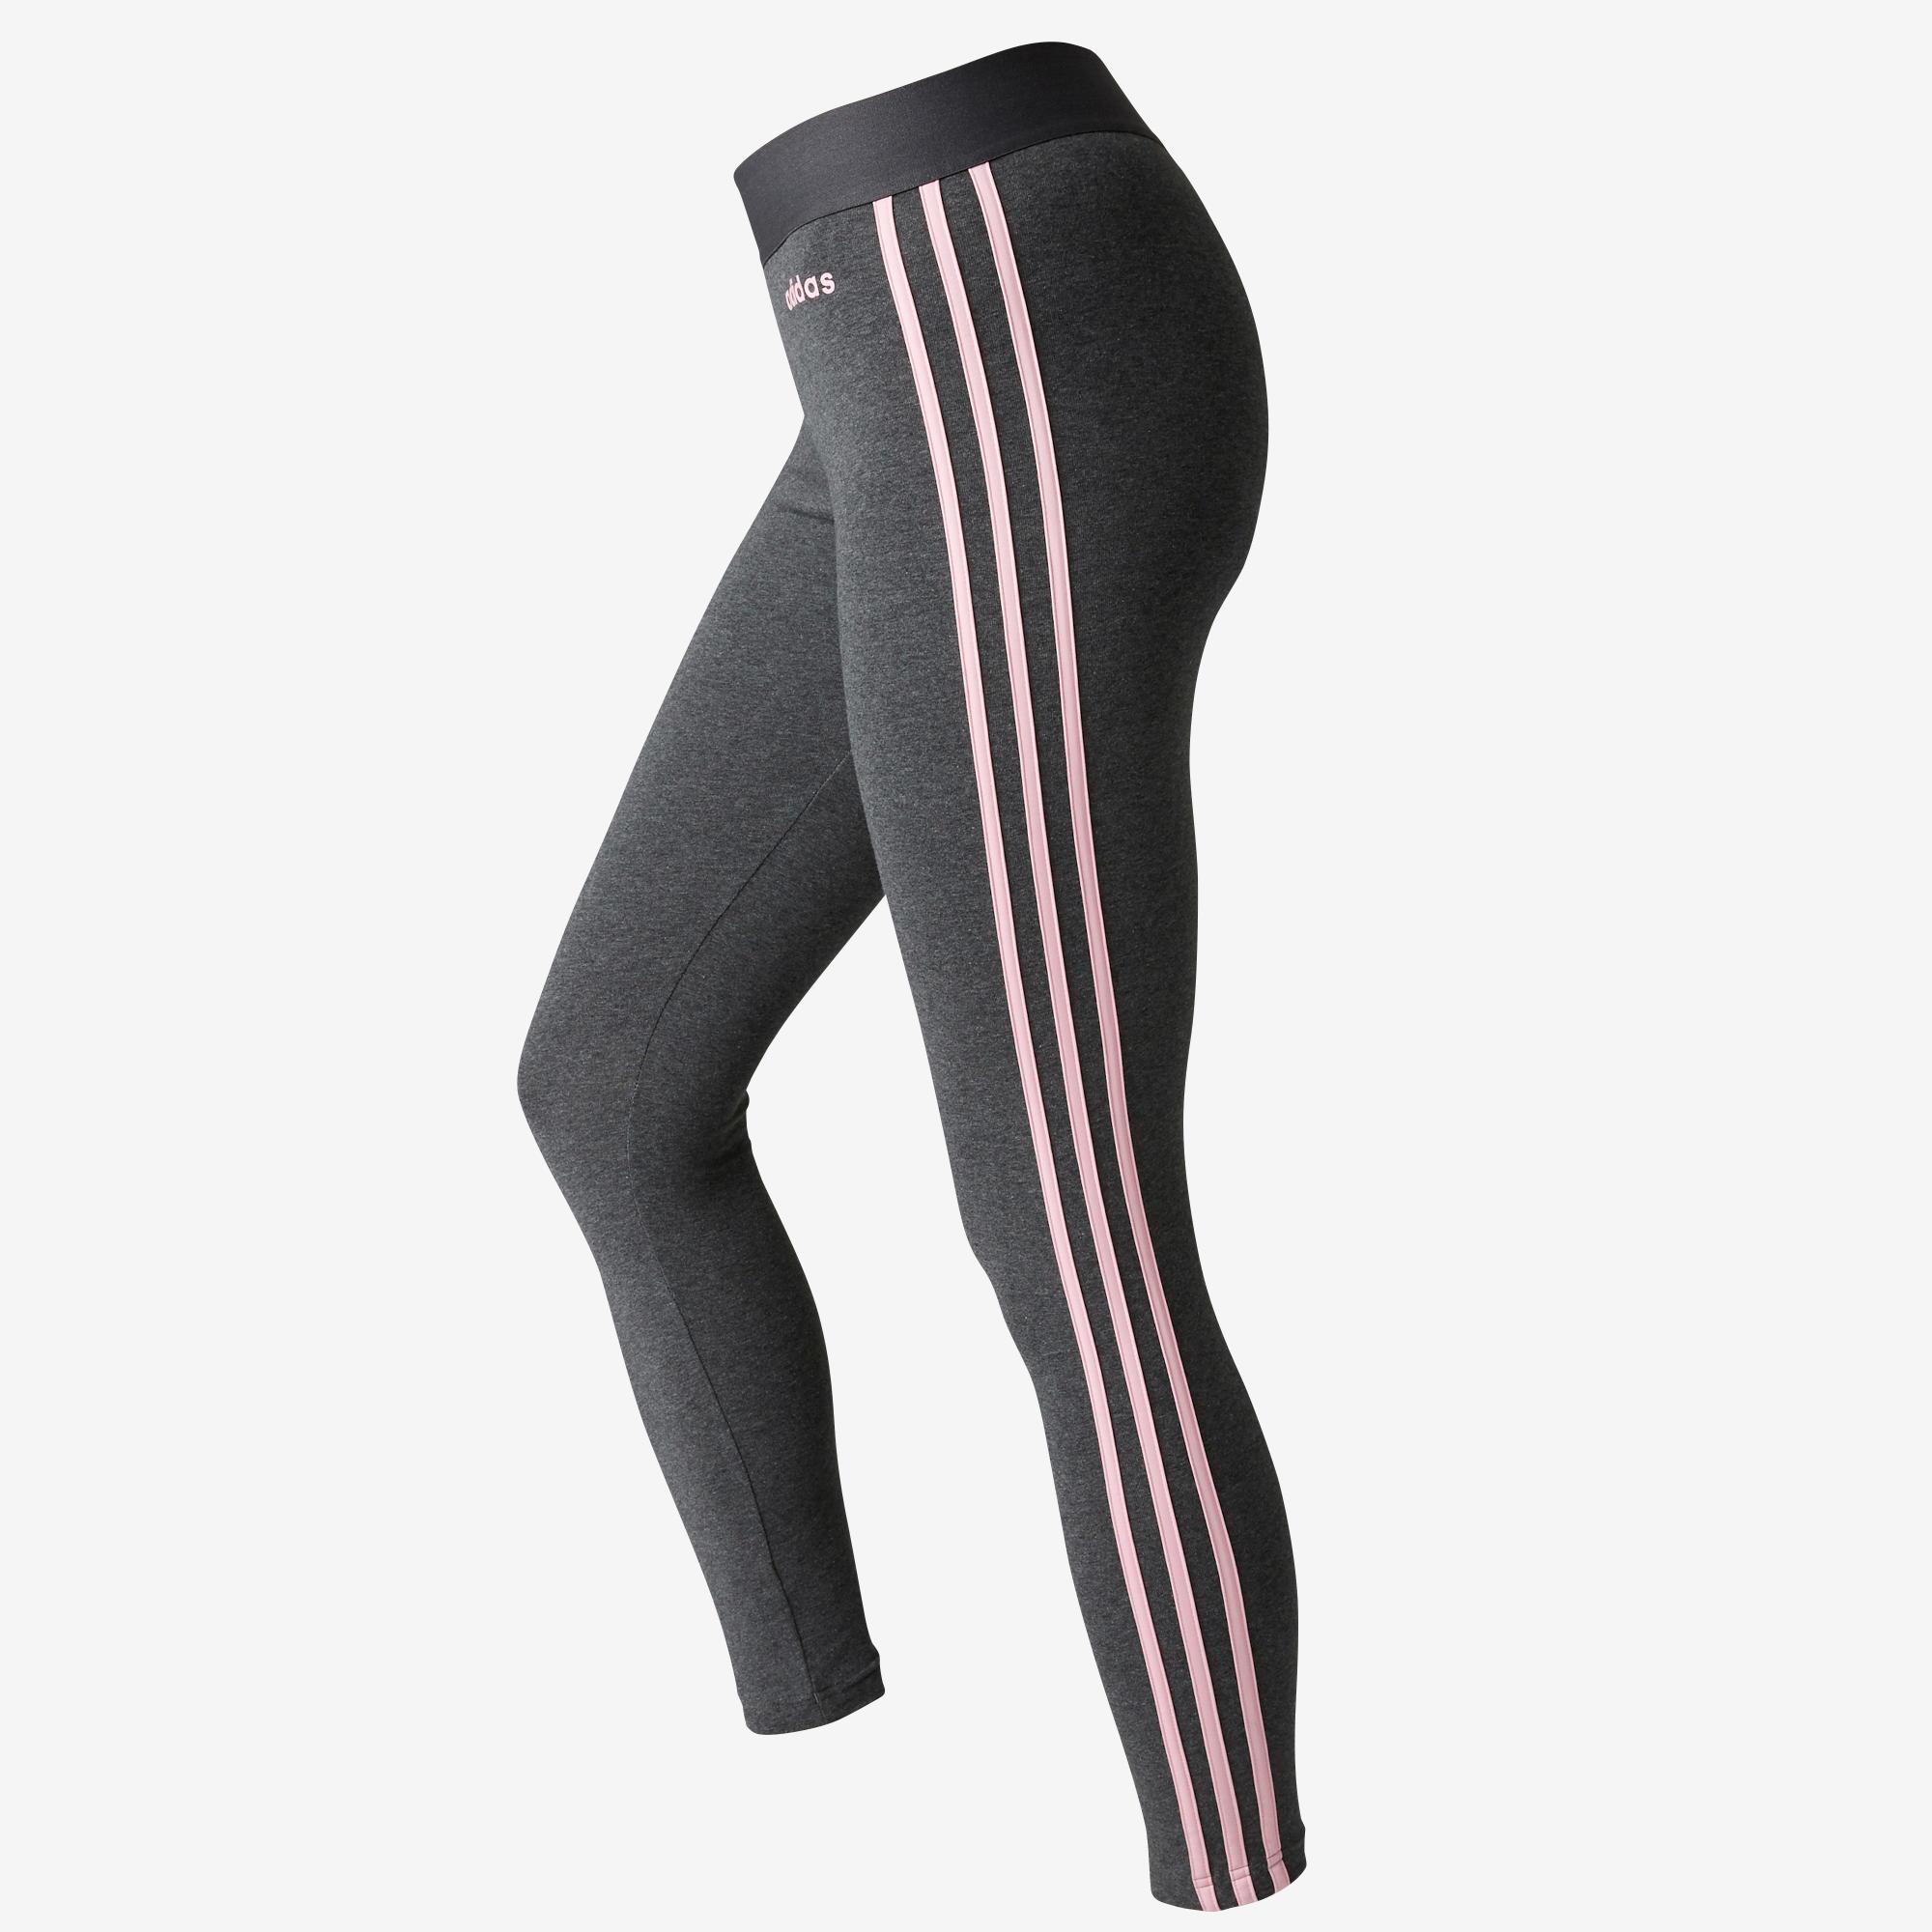 f11091b5a7a 3s Grijsroze 500 Pilates Adidas Legging Gym Lichte Dames wHAxq5OT